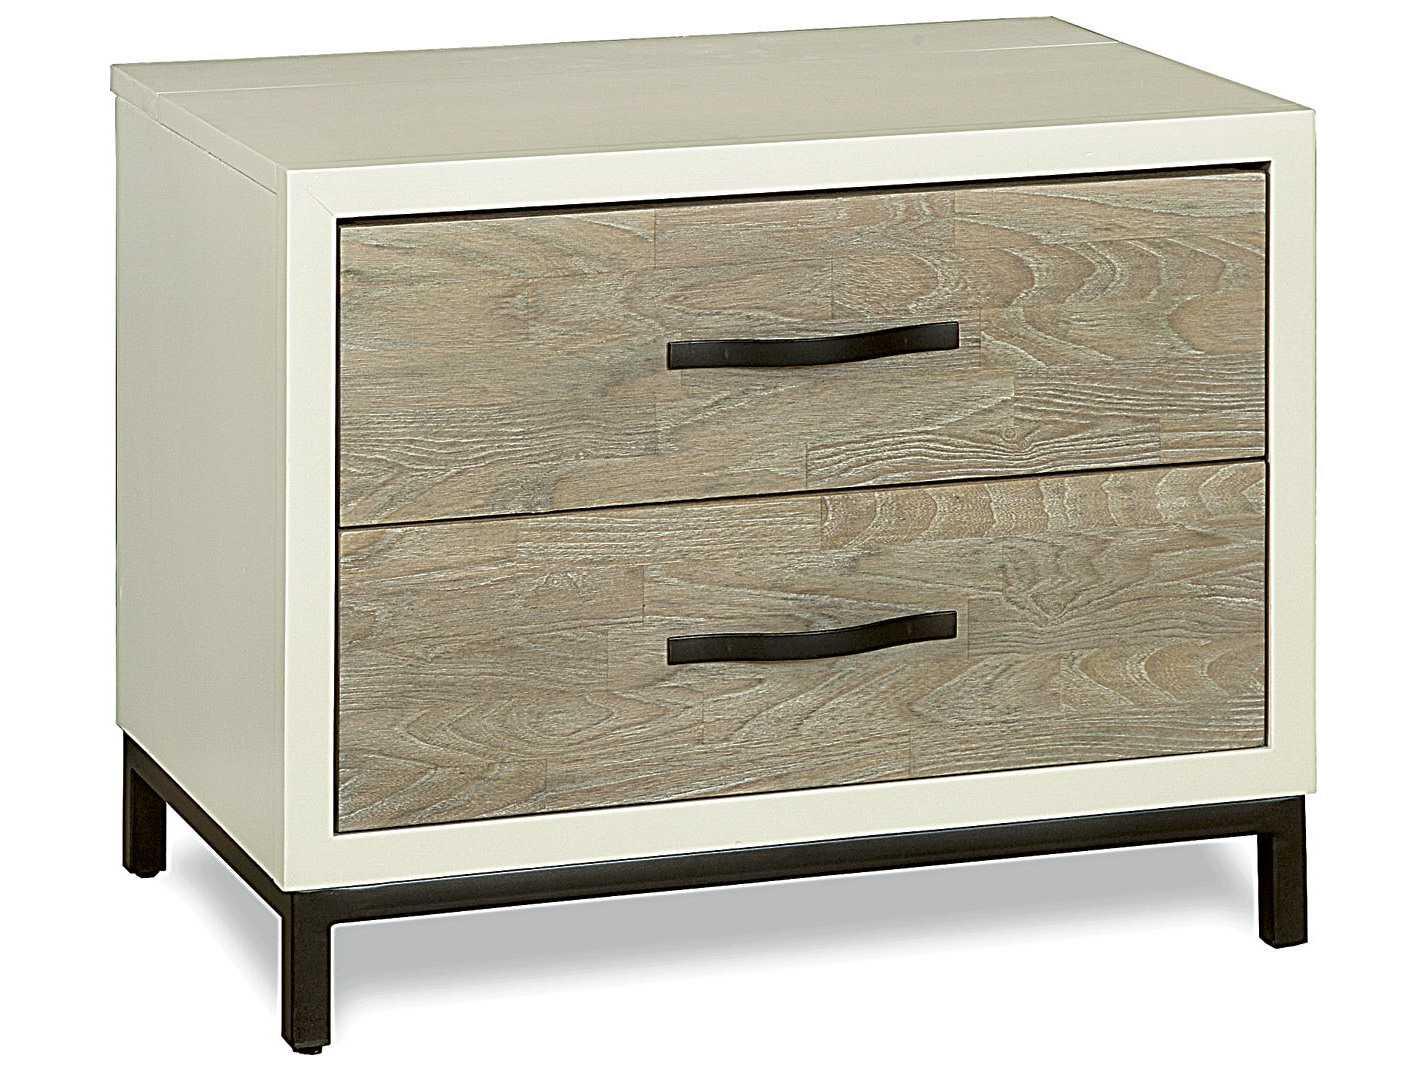 Universal furniture spencer 27 39 39 l x 18 39 39 w rectangular gray - Universal broadmoore bedroom furniture ...